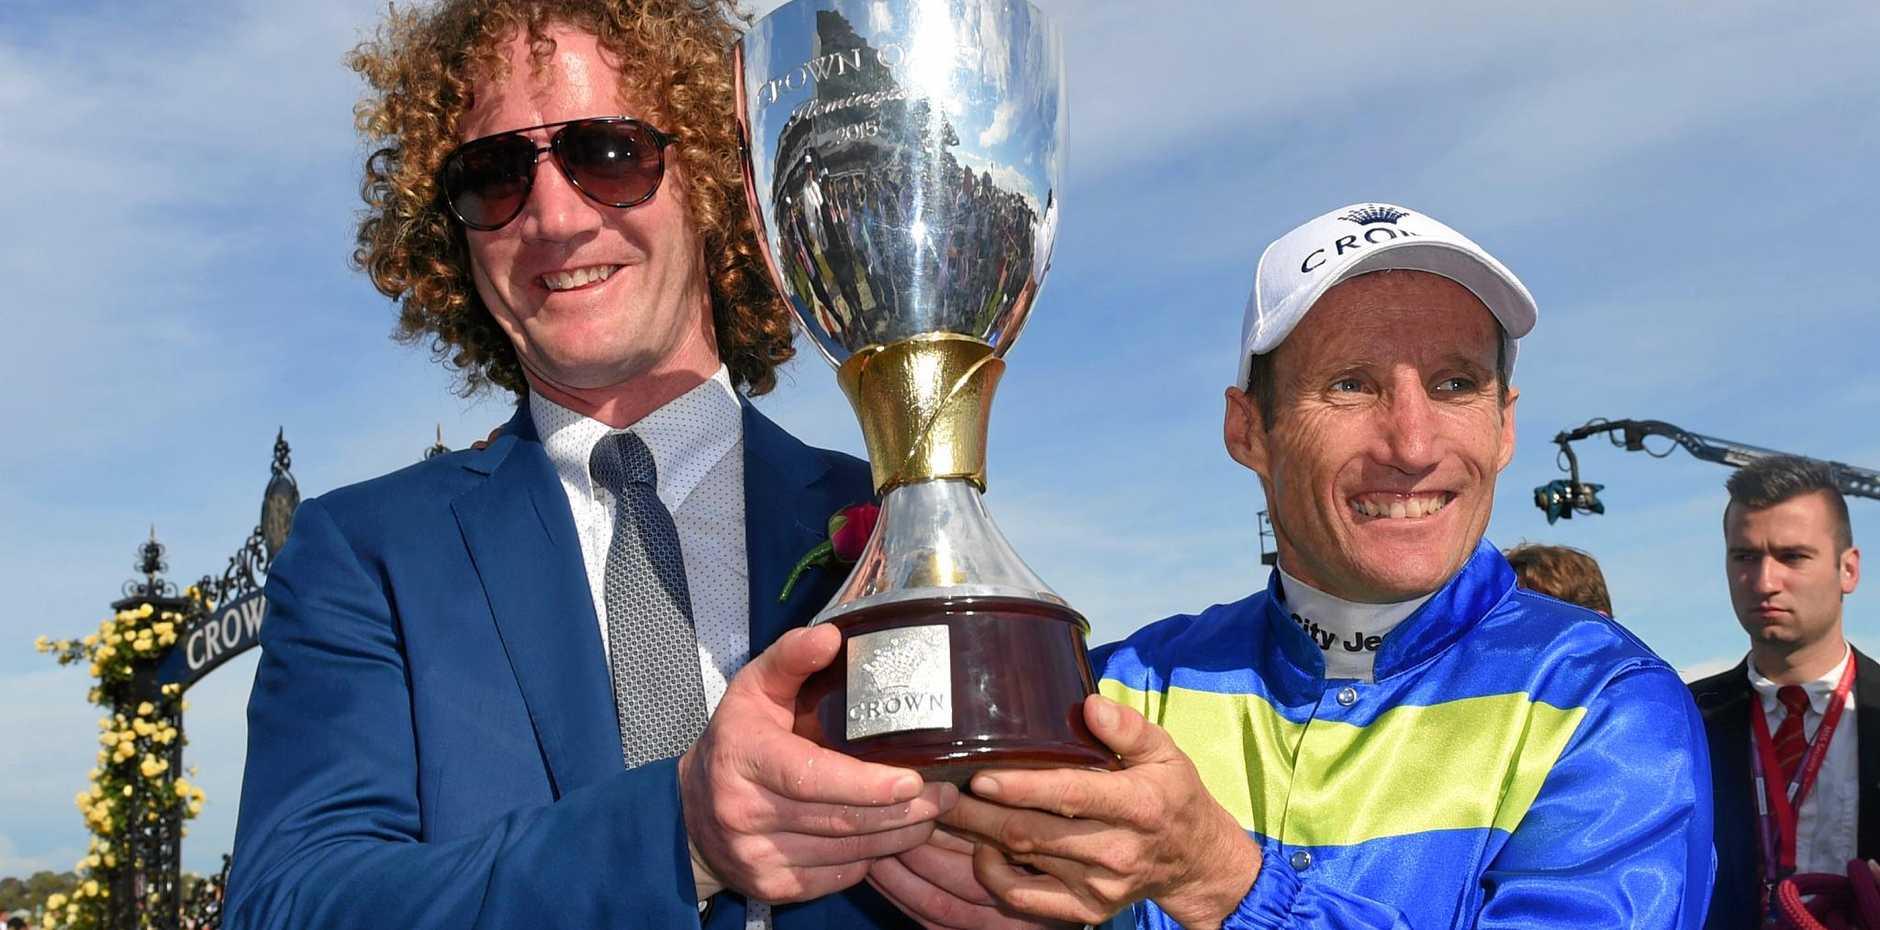 Trainer Ciaron Maher (left) and jockey Damien Oliver celebrate after Jameka won the Crown Oaks at Flemington Racecouse last November.